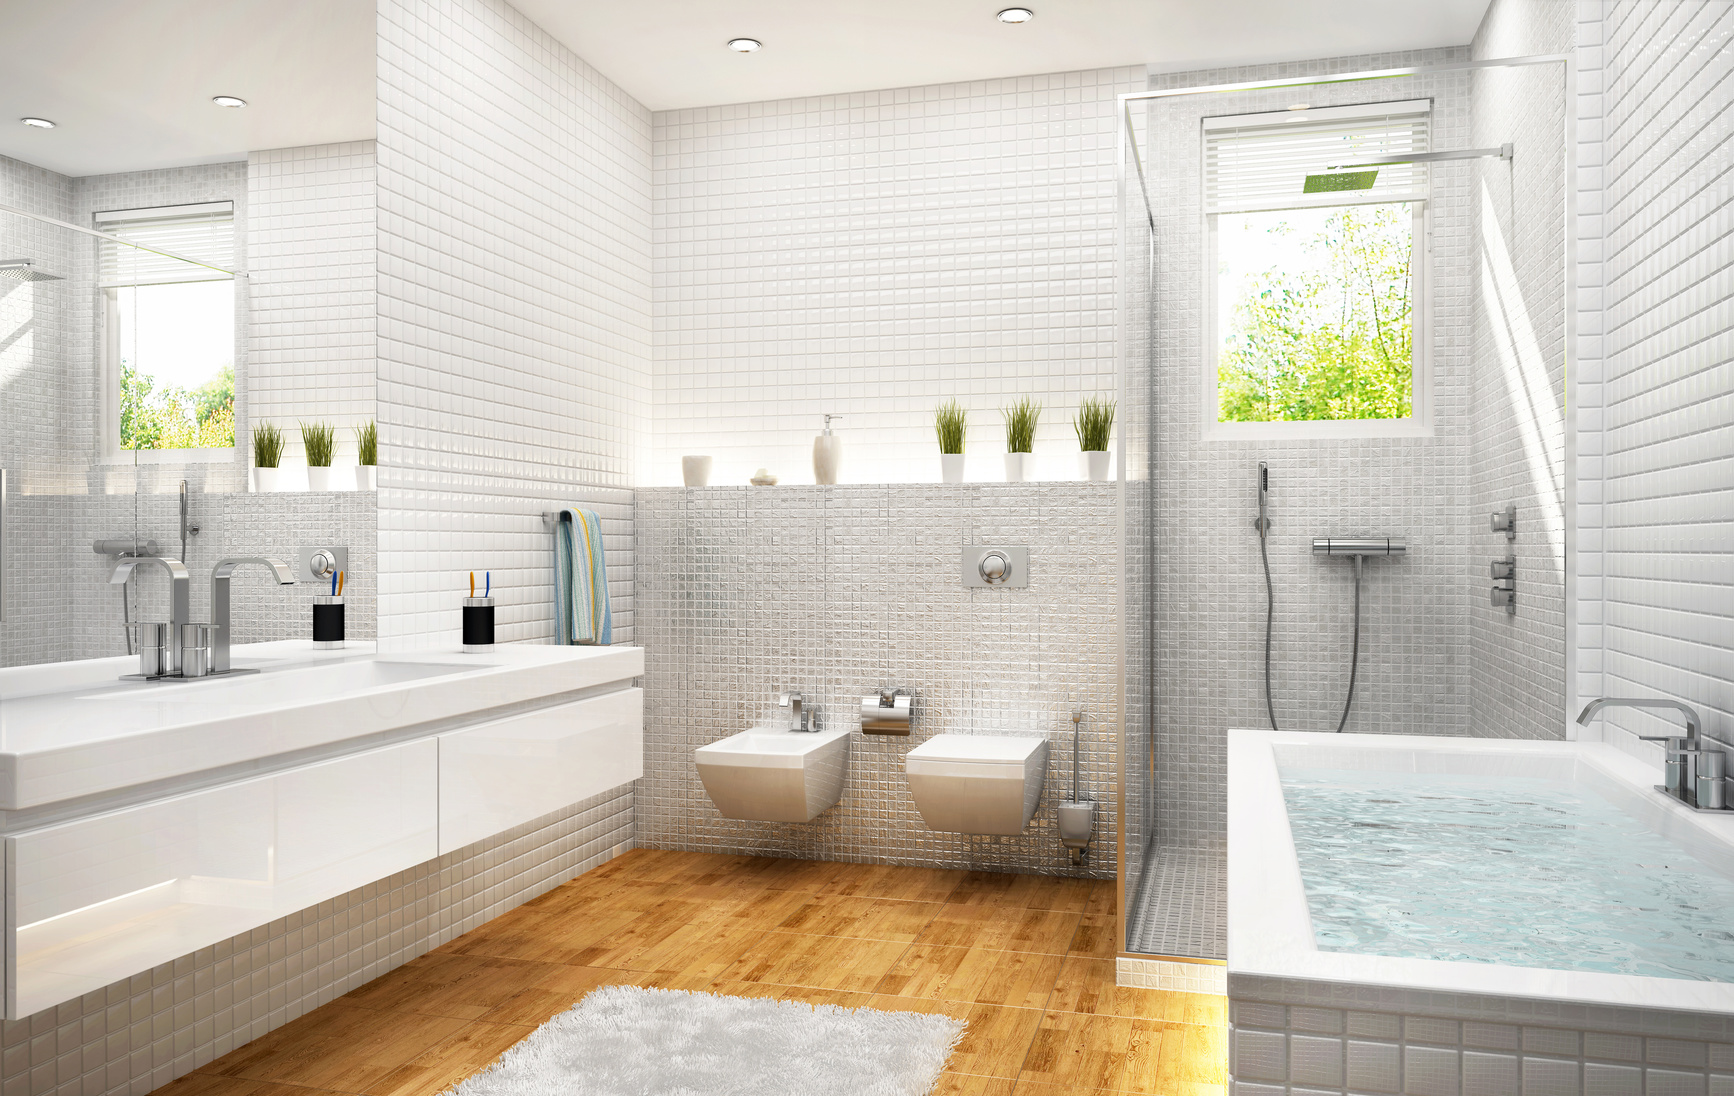 Edles für Badezimmer – Parkett in Sanitärräumen - Hartmann